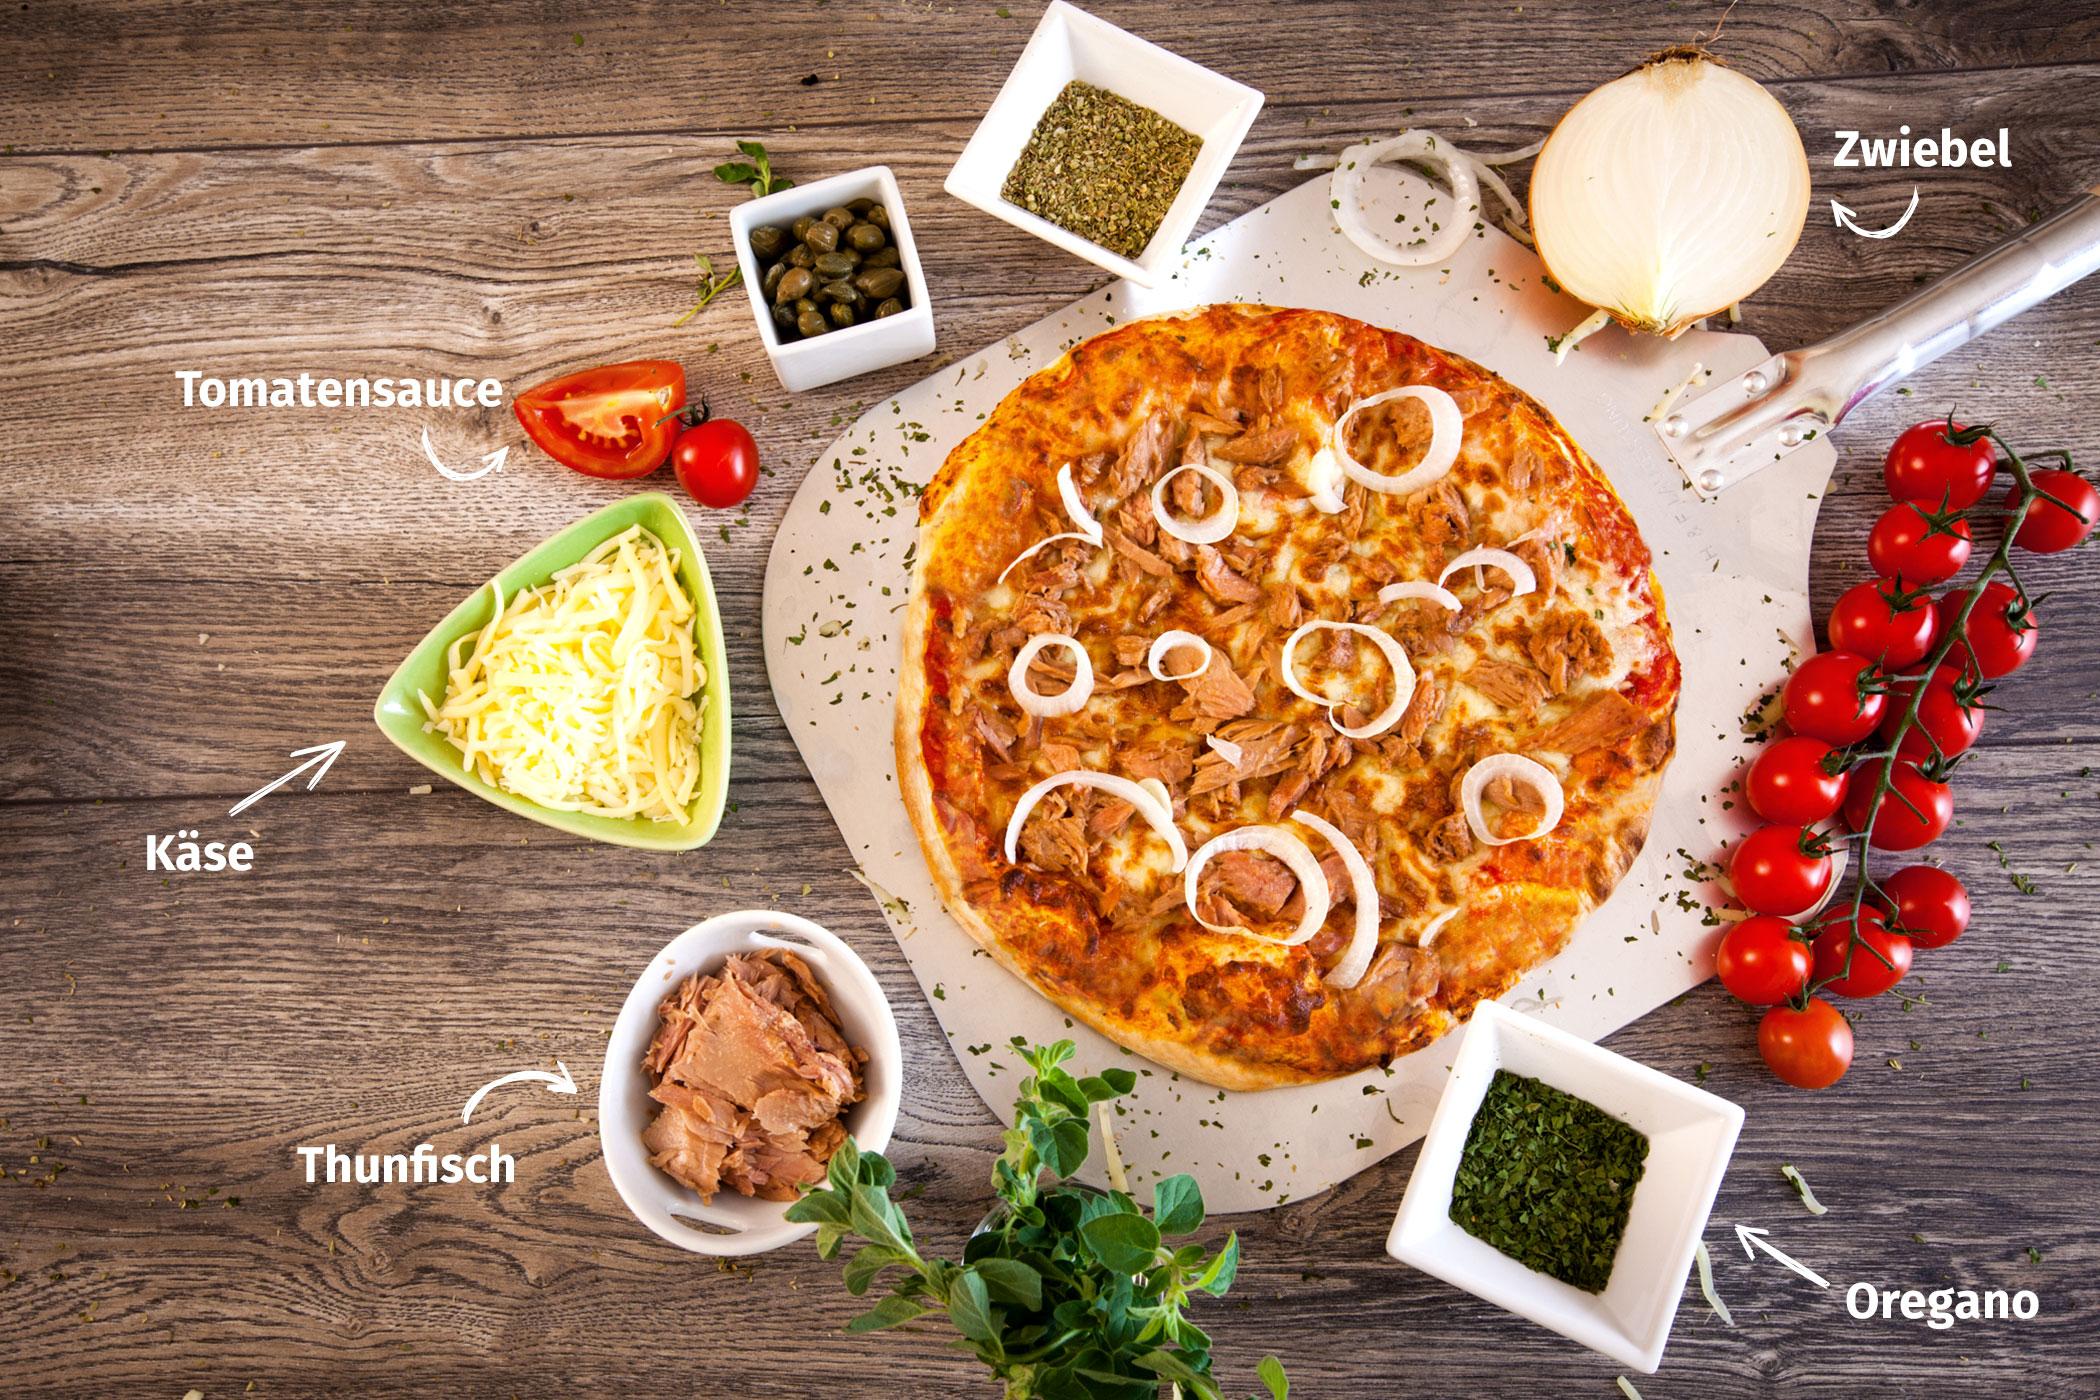 Original Franzesco Pizza Tonno mit Zutaten